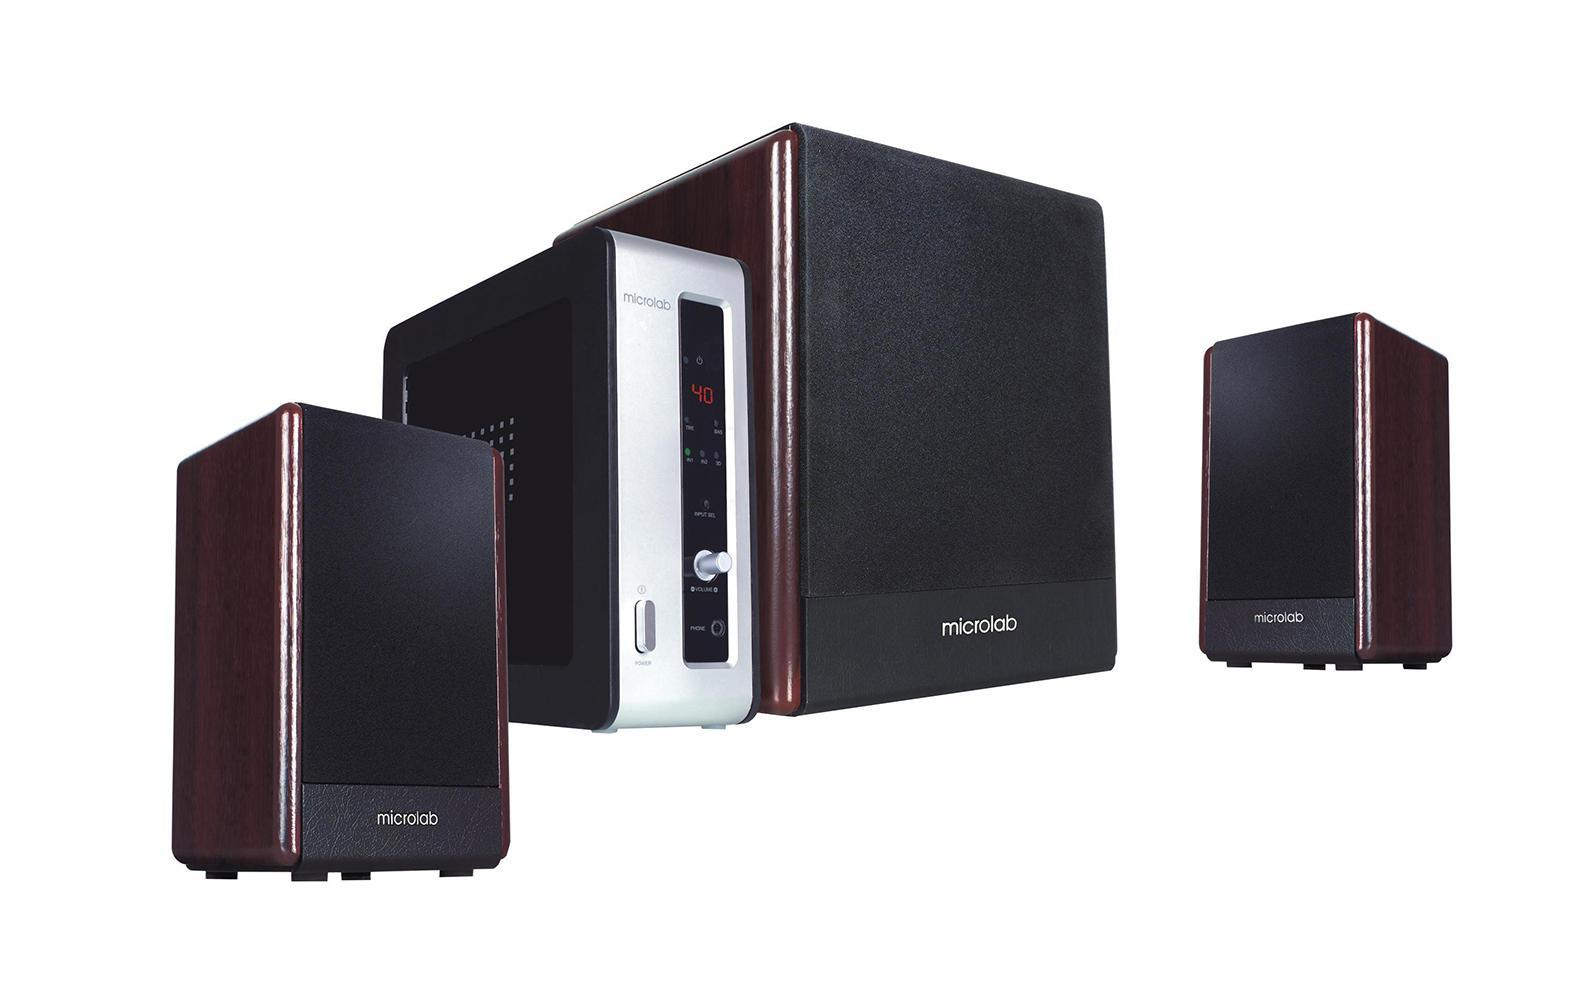 Фото - Microlab FC-530, Dark Wood акустическая система meike fc 100 for nikon canon fc 100 macro ring flash light nikon d7100 d7000 d5200 d5100 d5000 d3200 d310